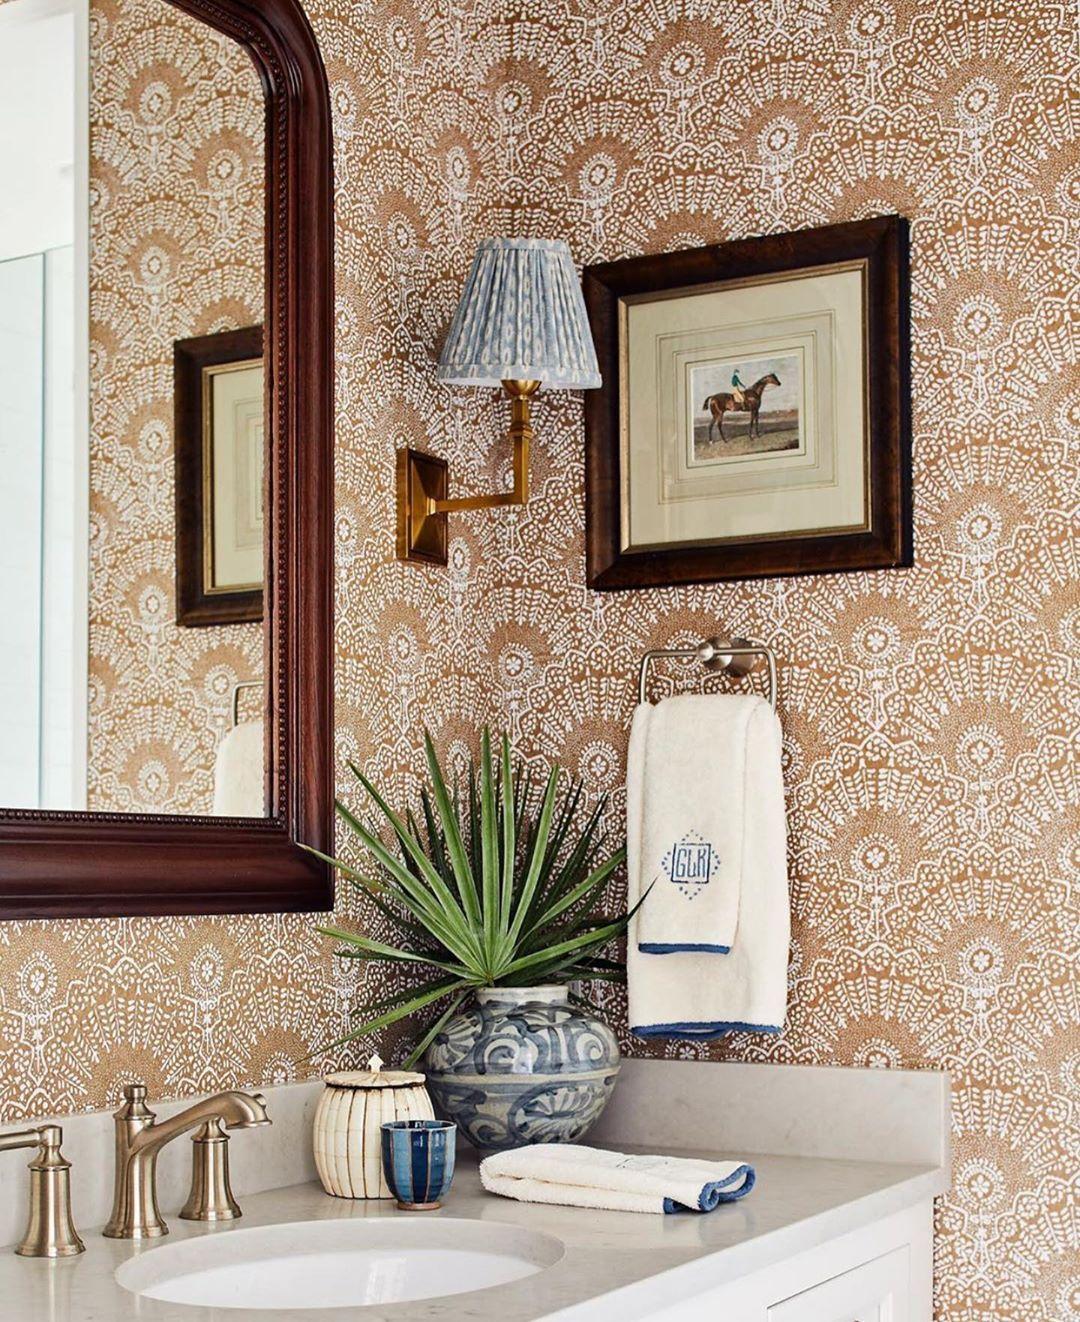 Alexandra Wood On Instagram Powder Room Perfection By Meredithellis I Love The In 2020 Trendy Bathroom Designs Wallpaper Design For Bedroom Bathroom Design Luxury